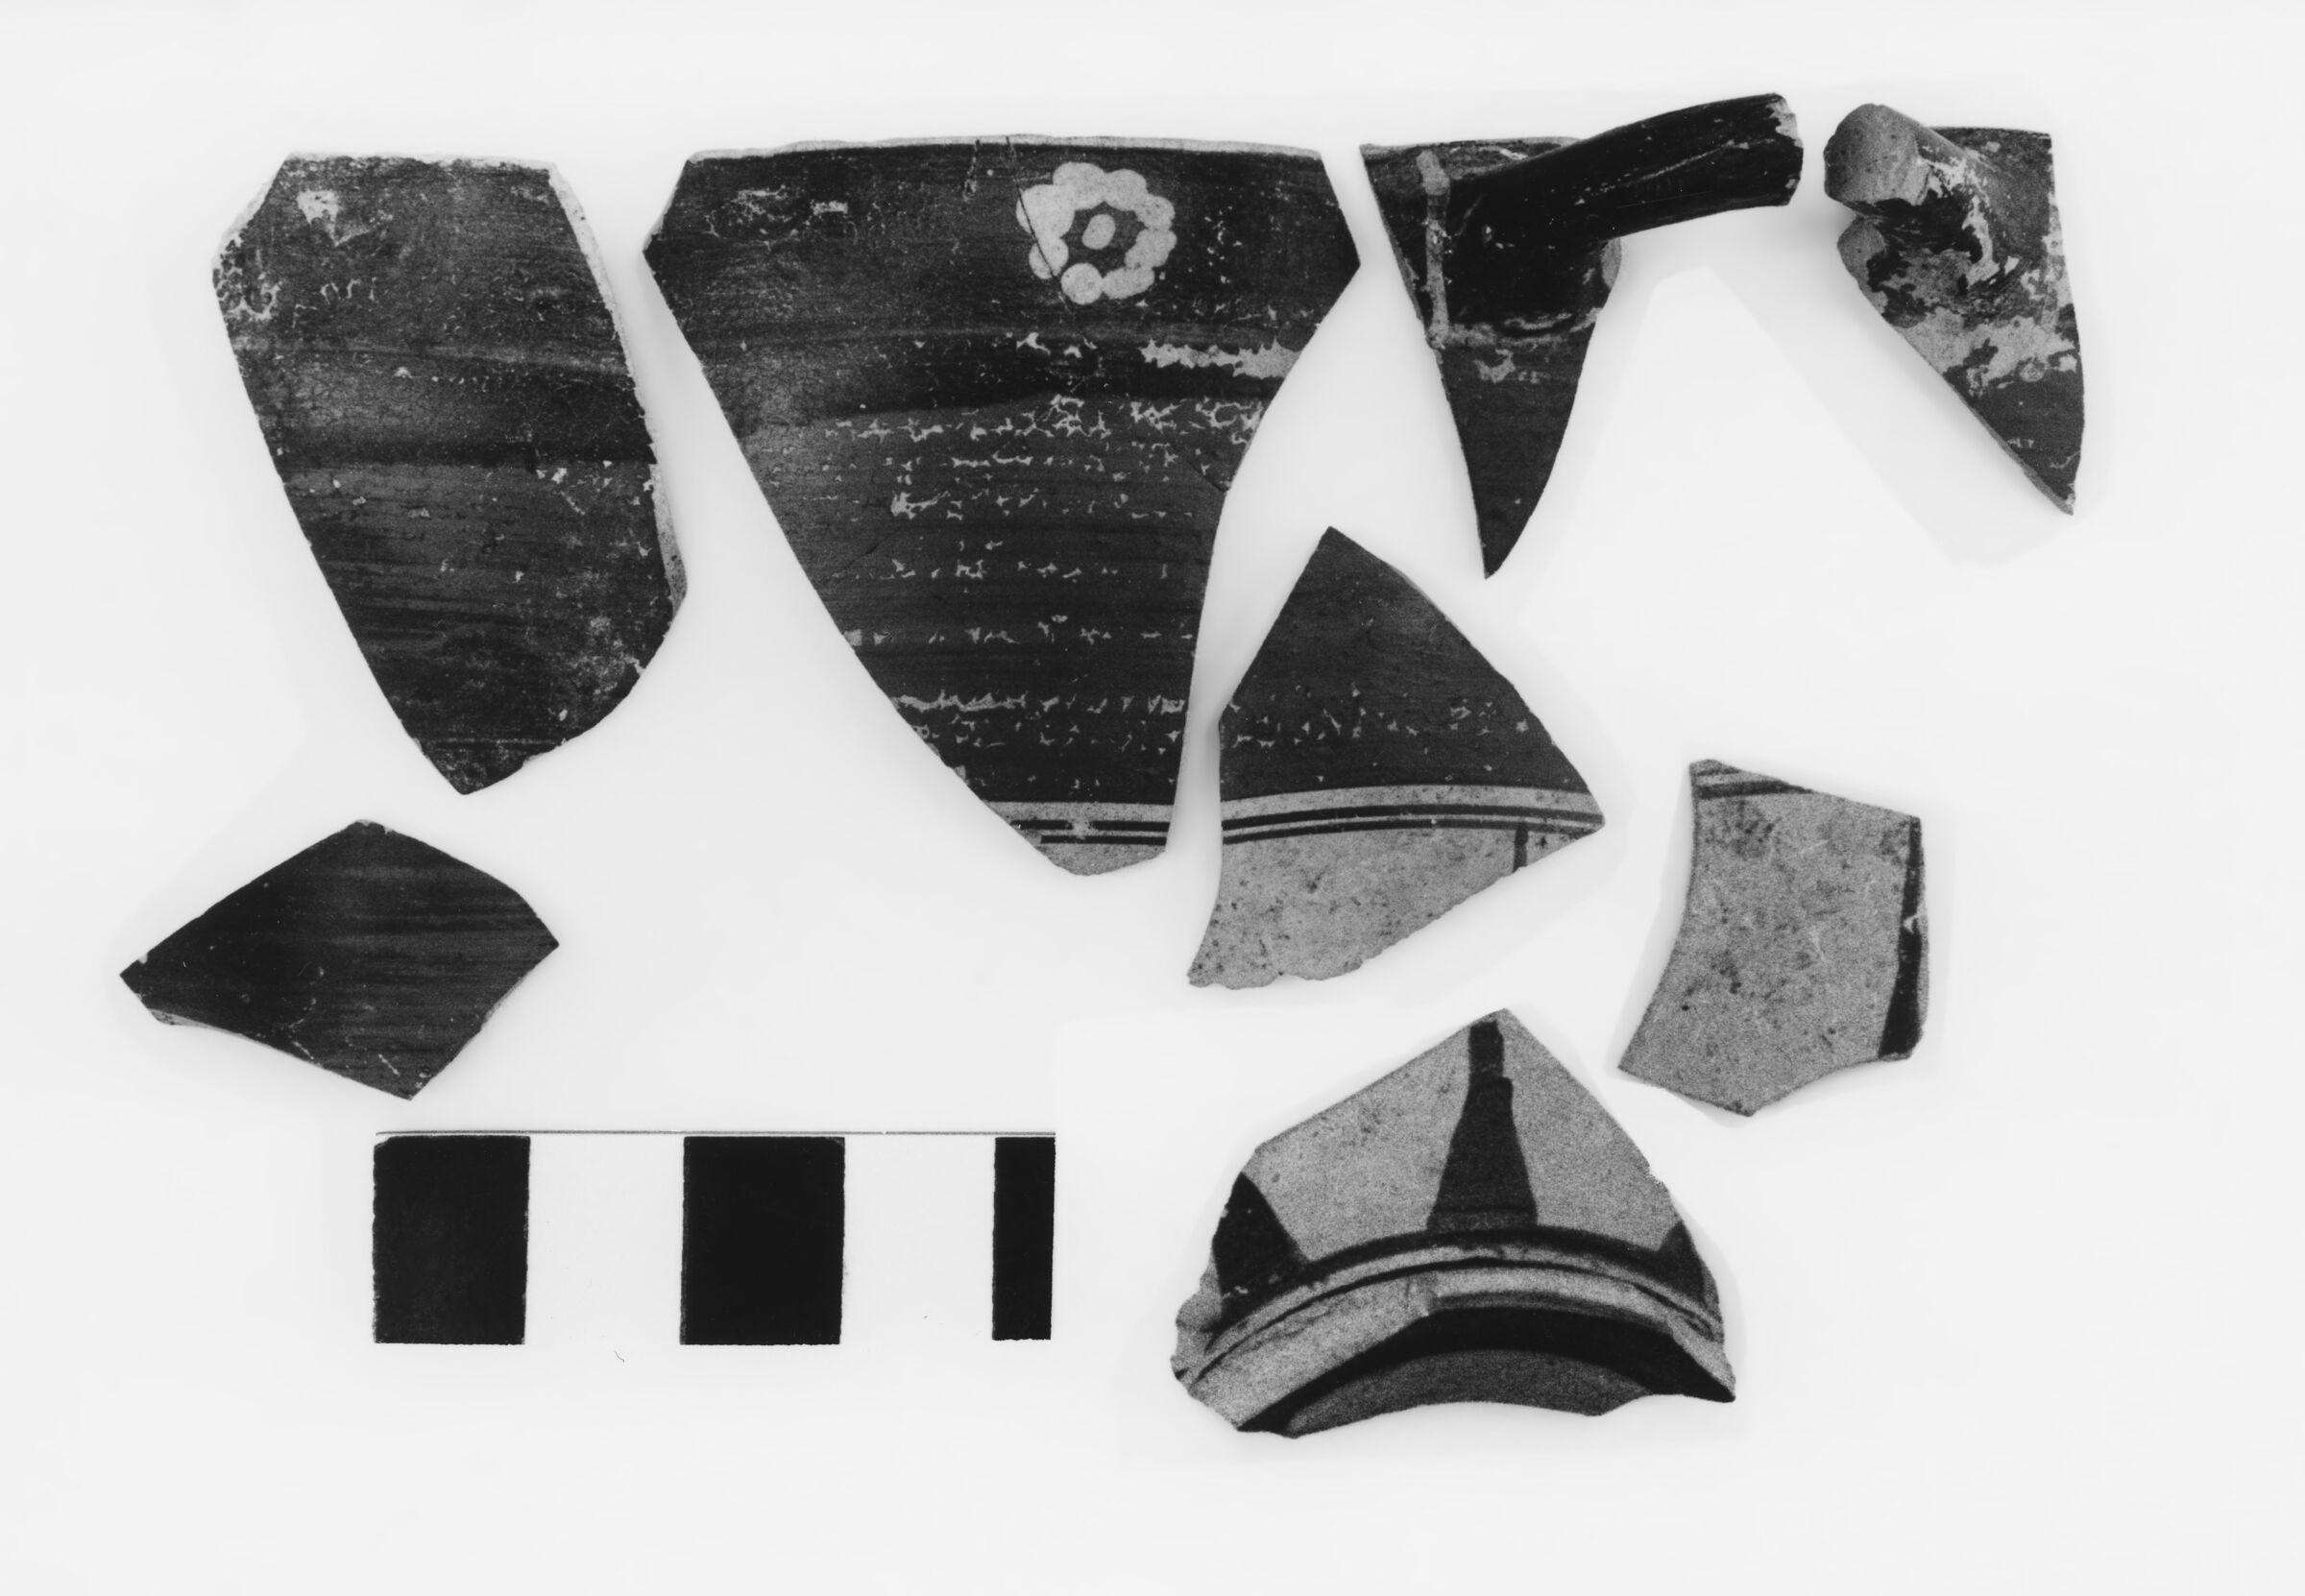 Corinthian Transitional Glazed Kotyle Fragments